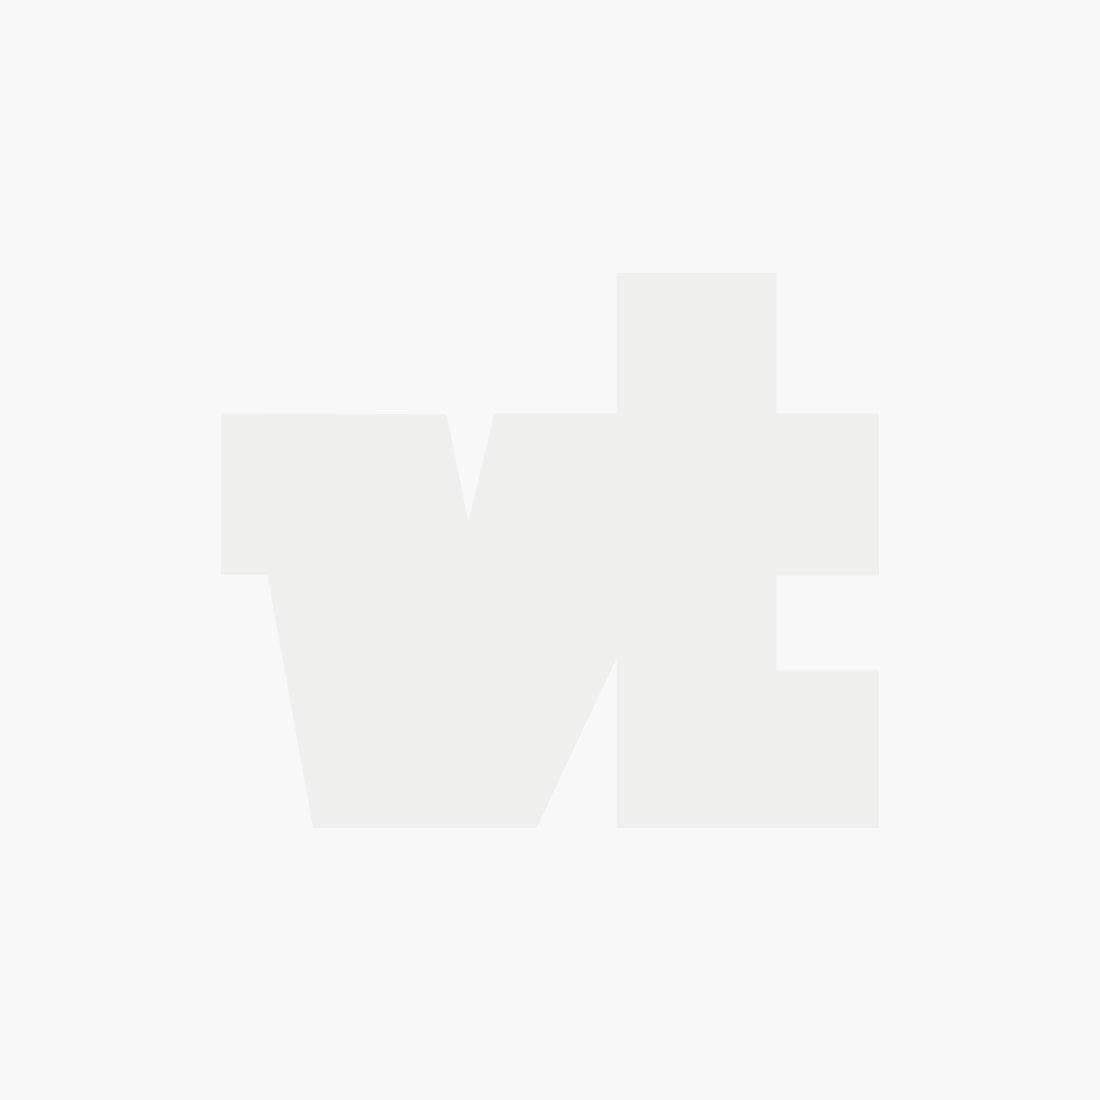 Vivi sneakers coll s709 green